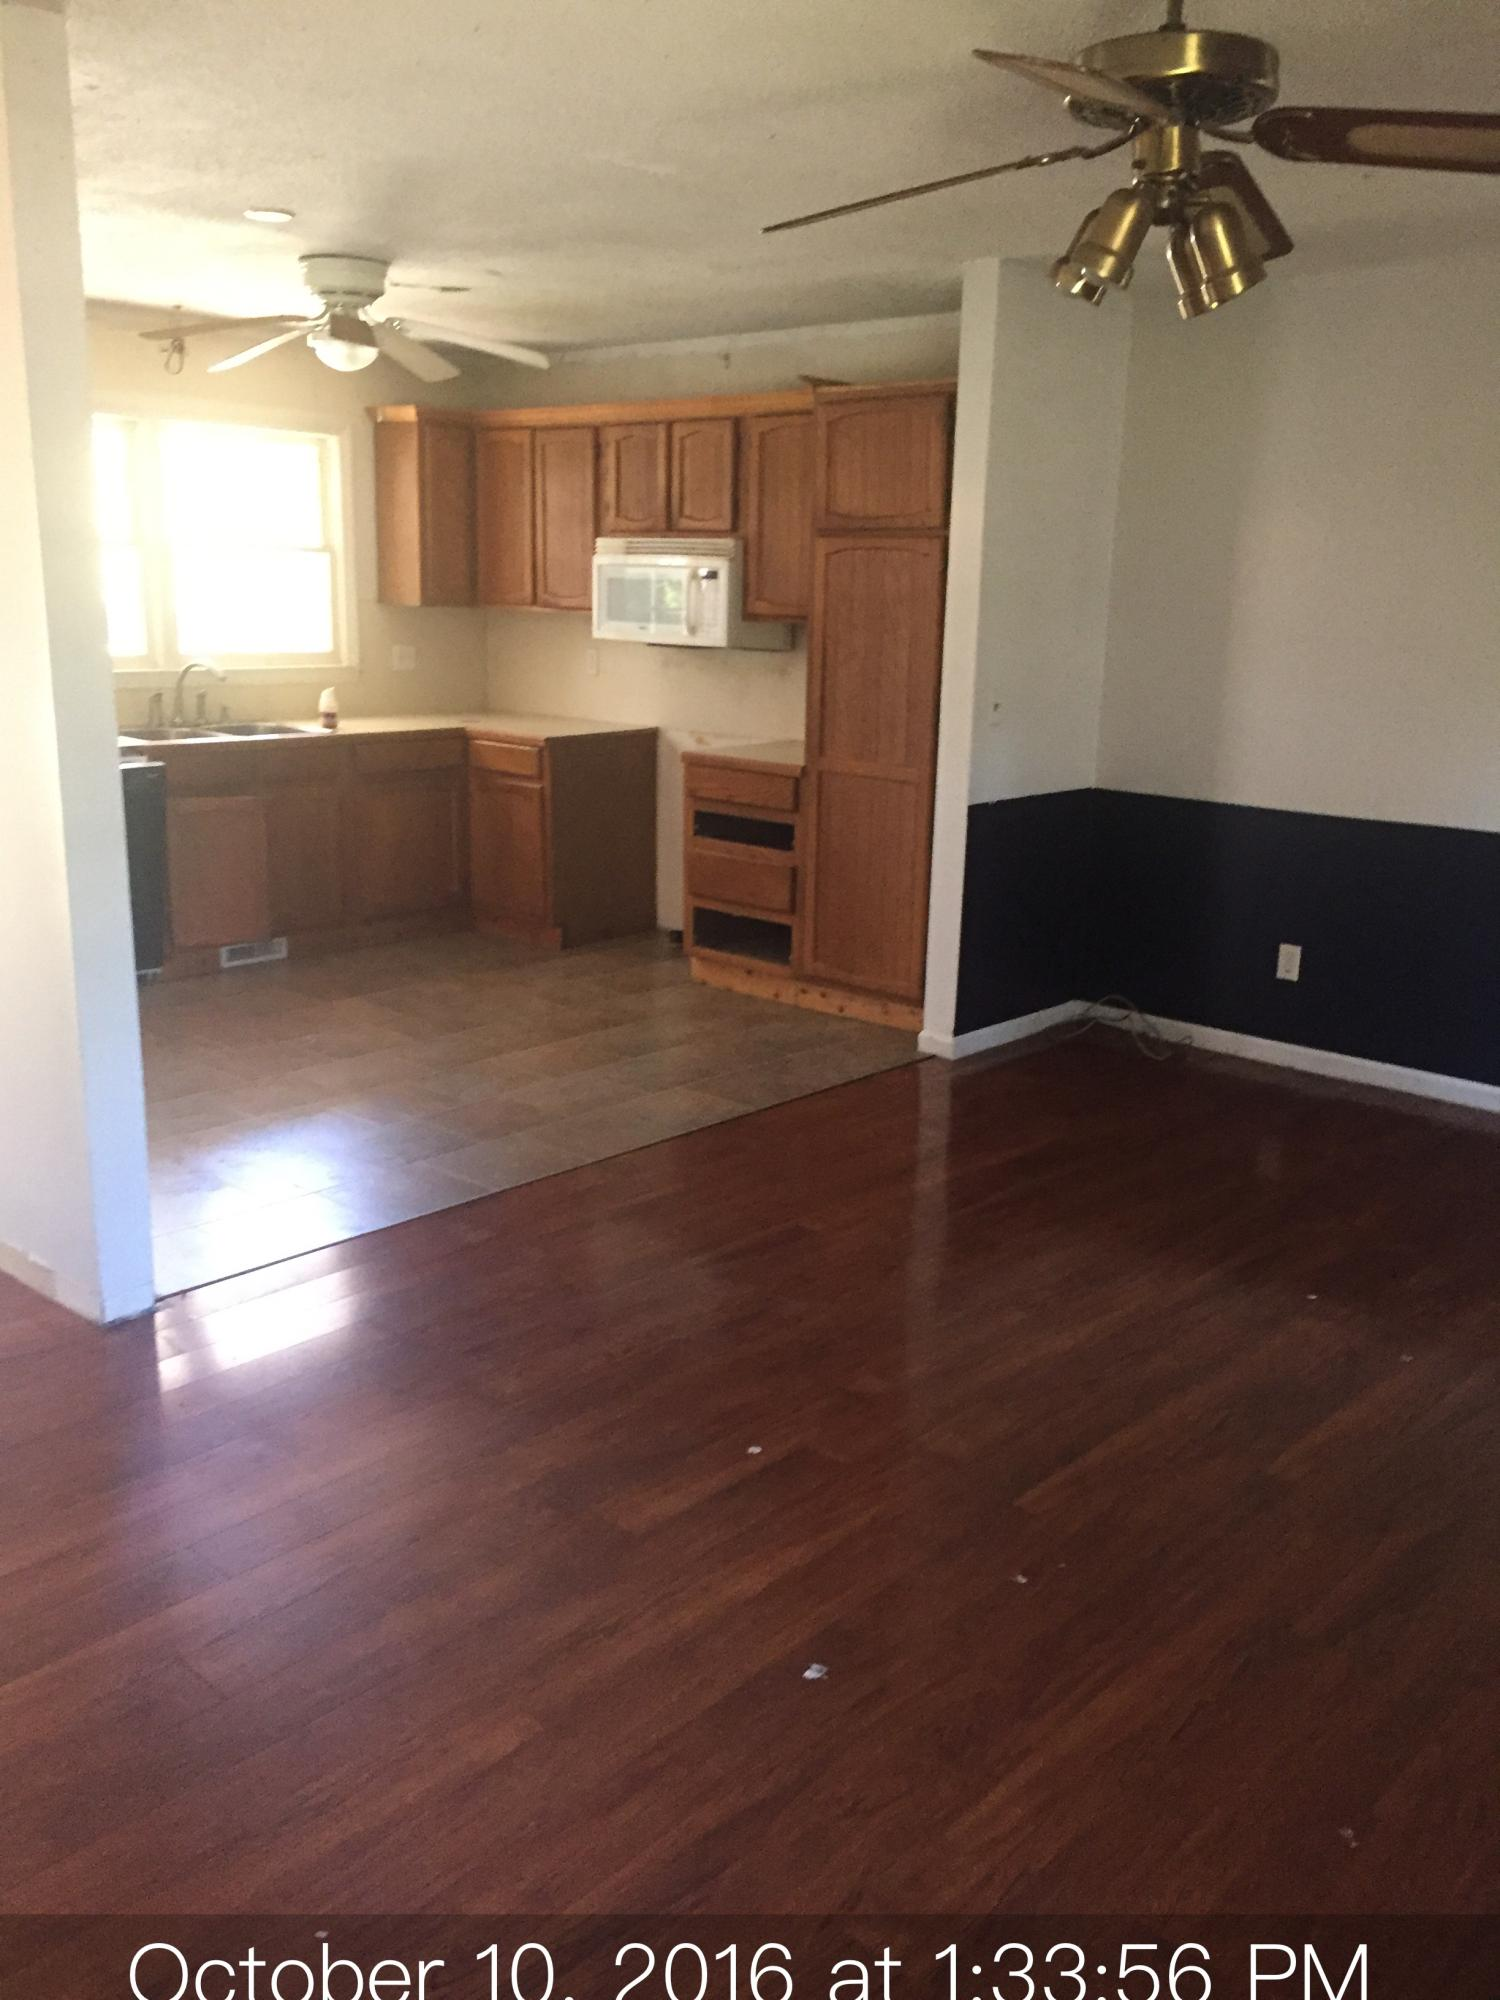 Double Oaks Homes For Sale - 1760 Dogwood, Charleston, SC - 8